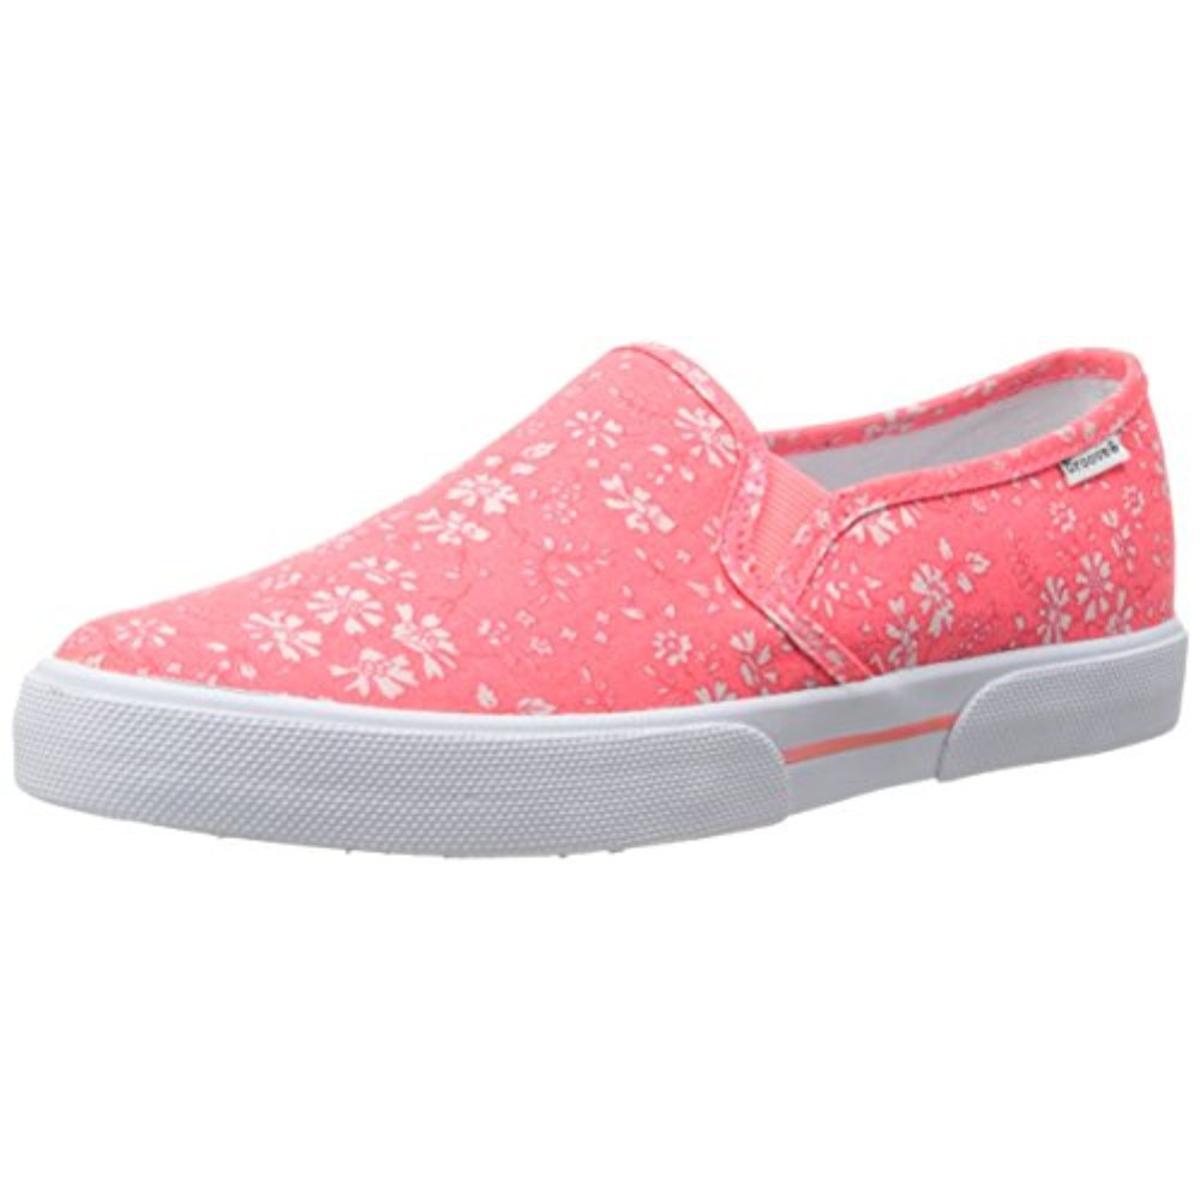 Canvas Slip On Shoes Ladies Retail